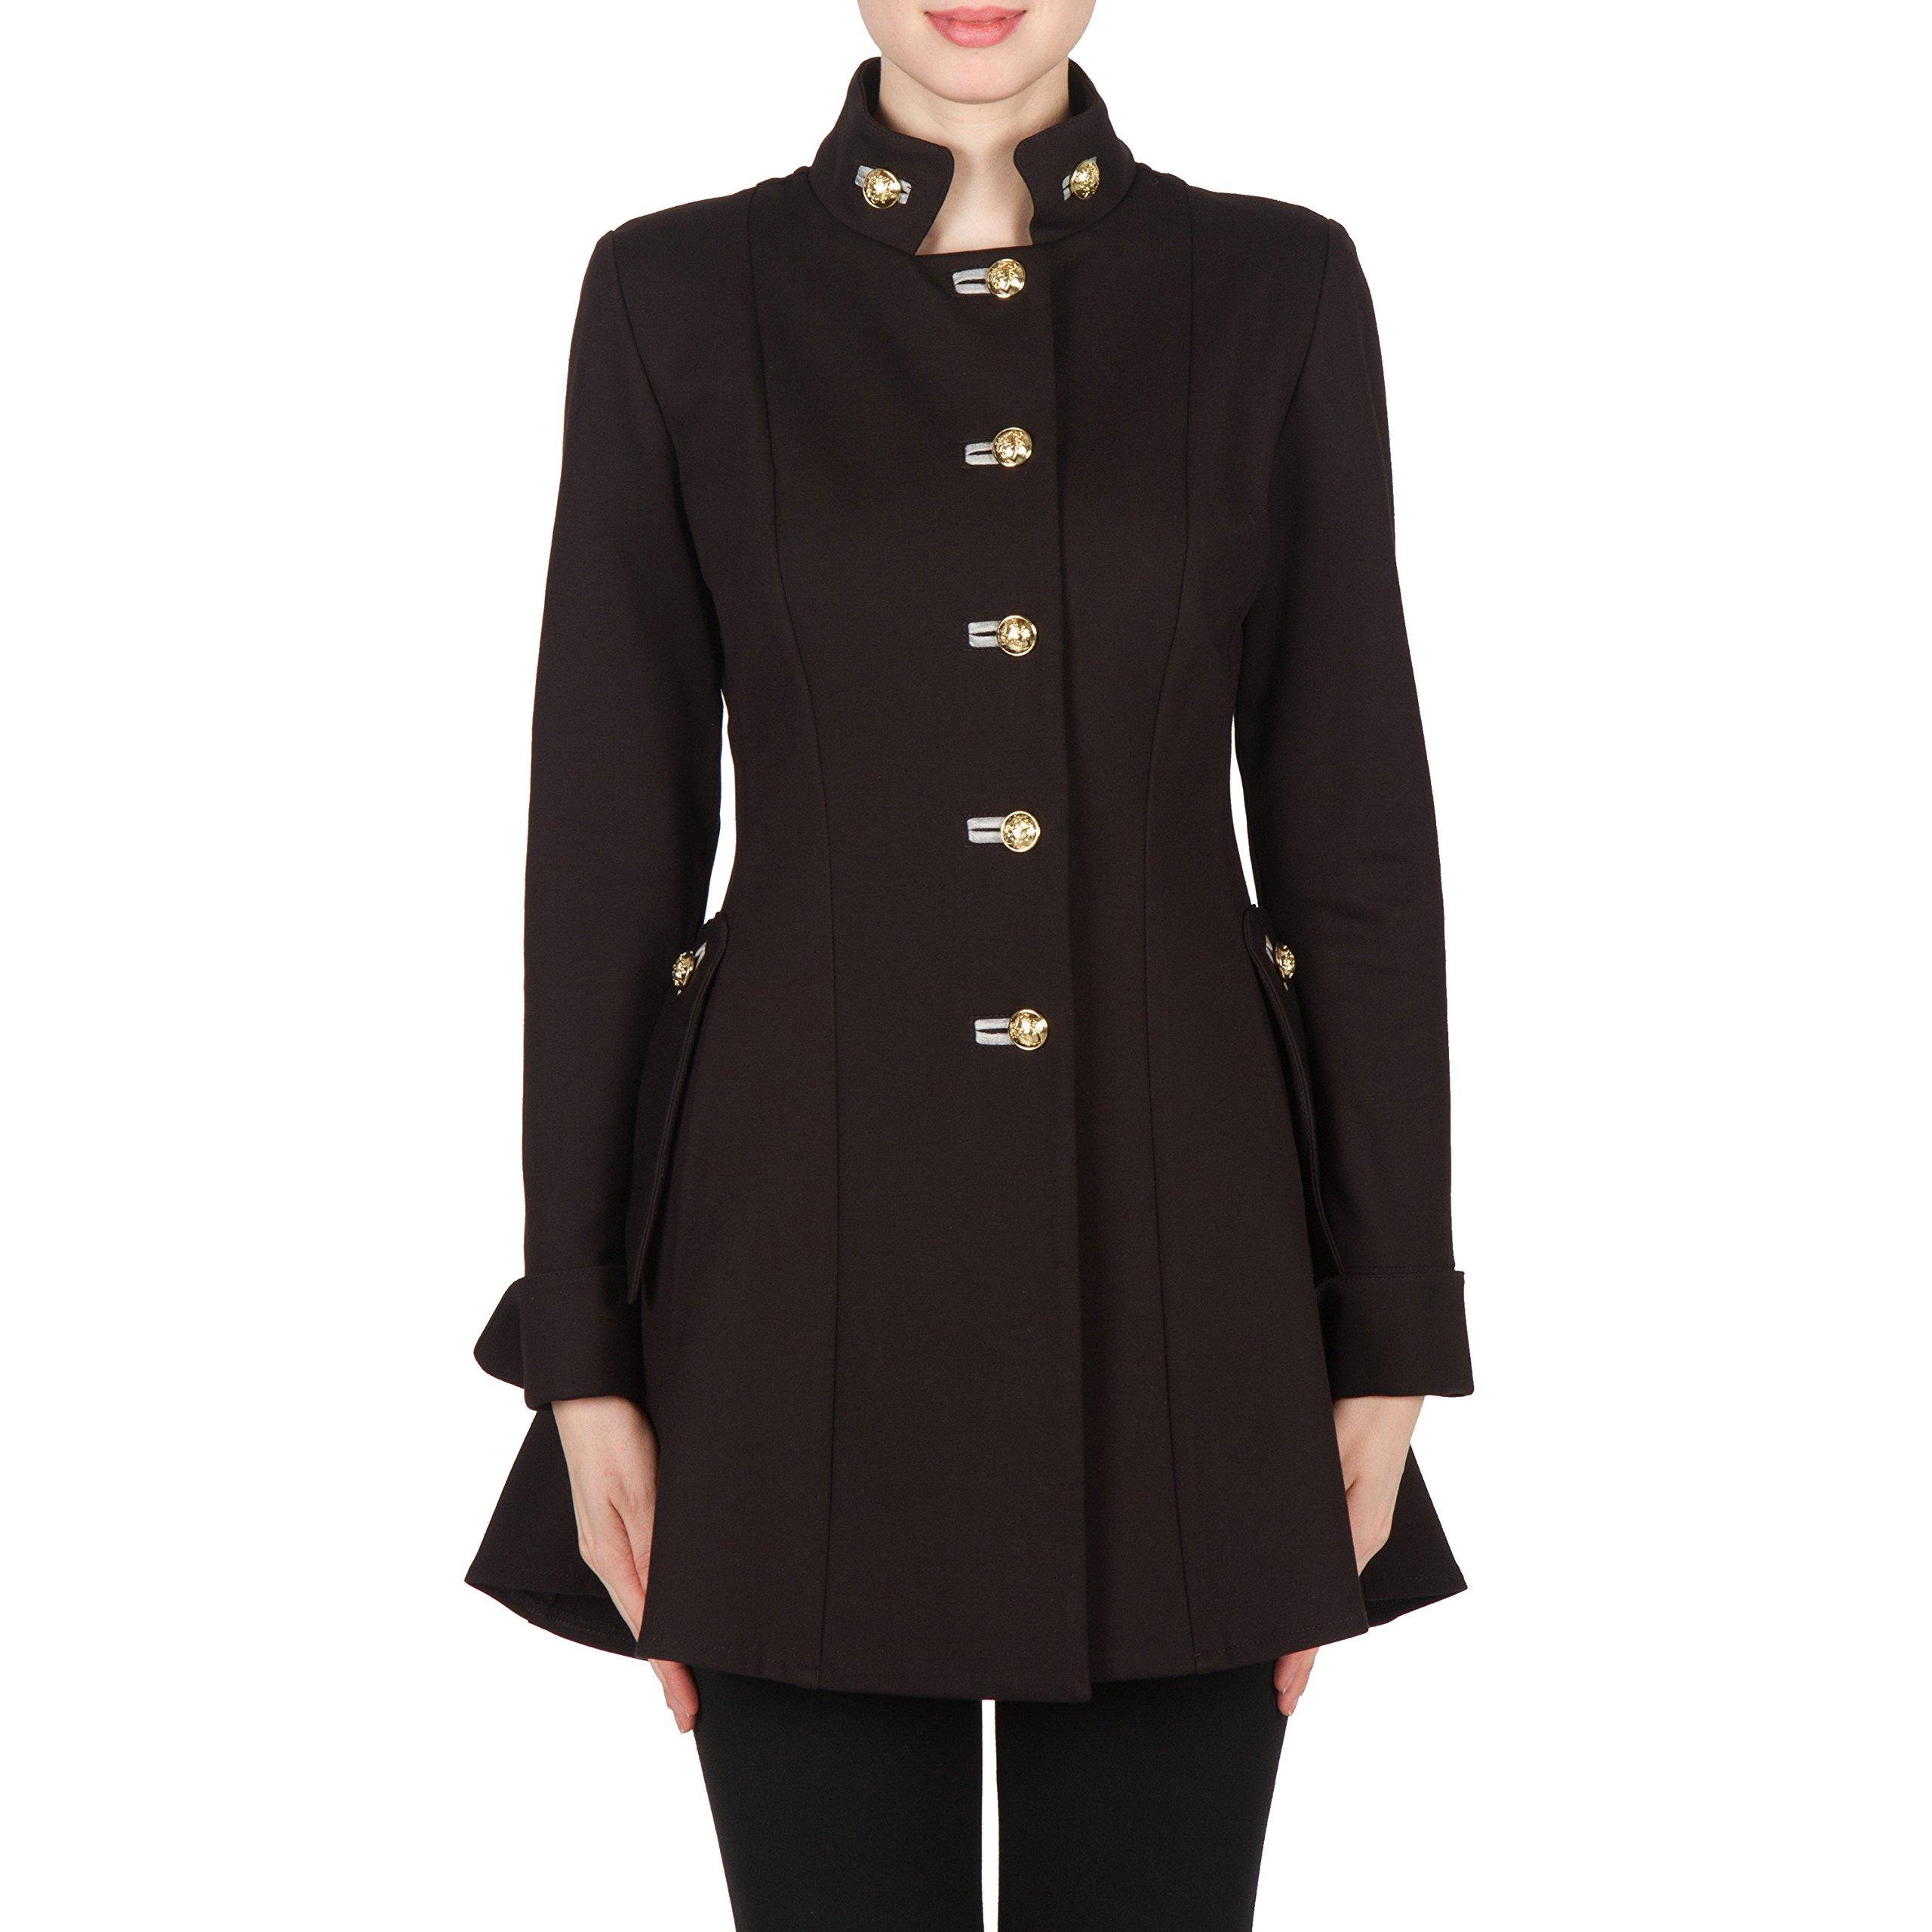 Joseph Ribkoff Coat Style 173308 (16)